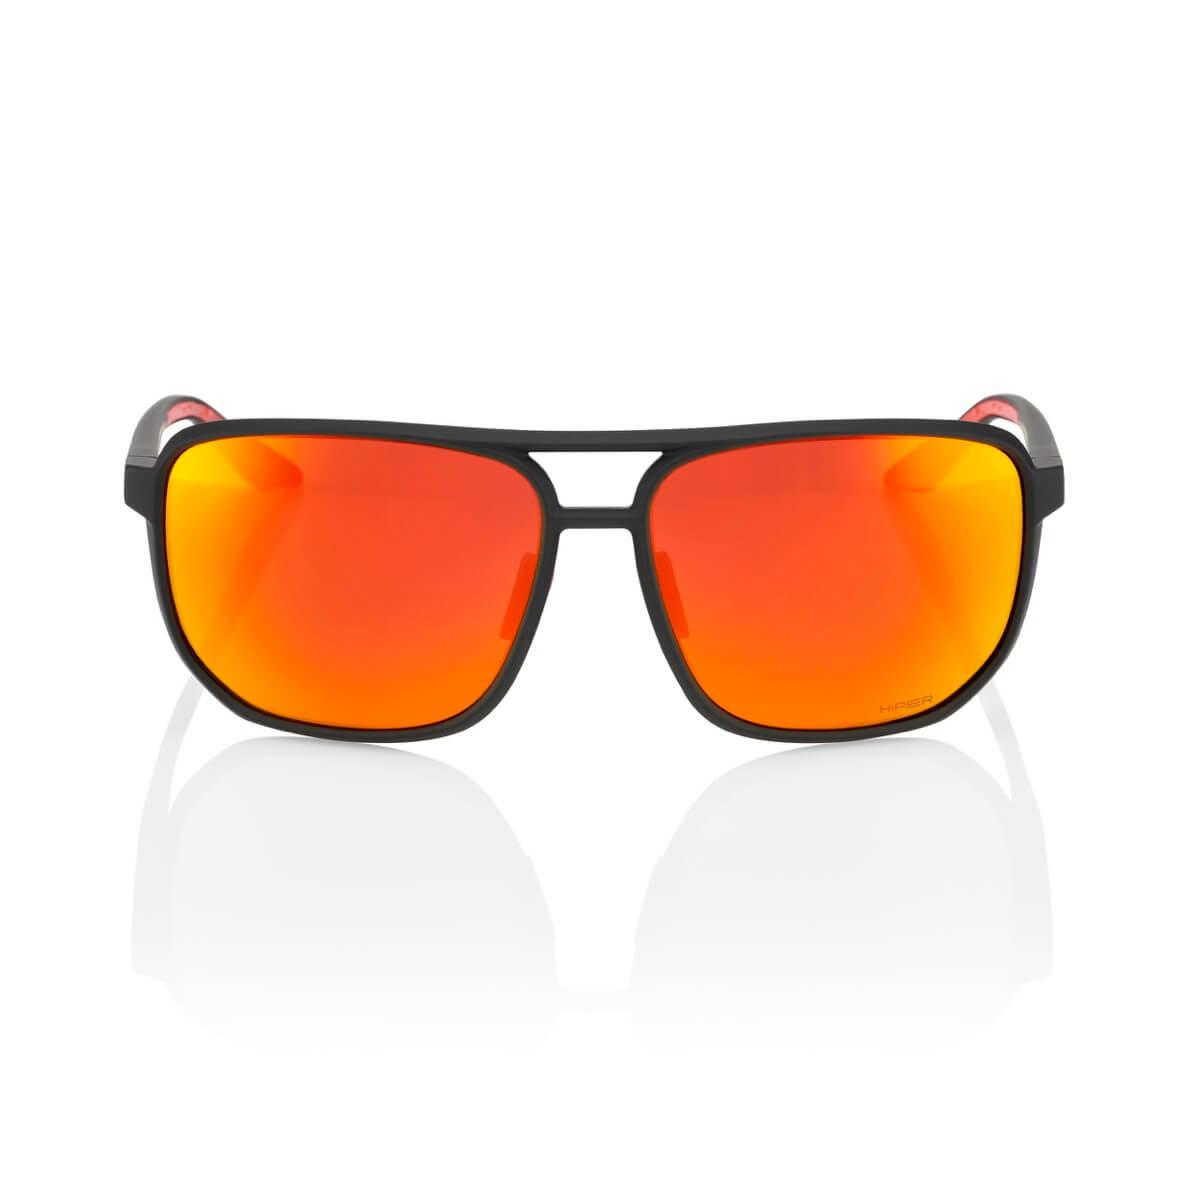 KONNOR Aviator Square – Soft Tact Black – HiPER Red Multilayer Mirror Lens